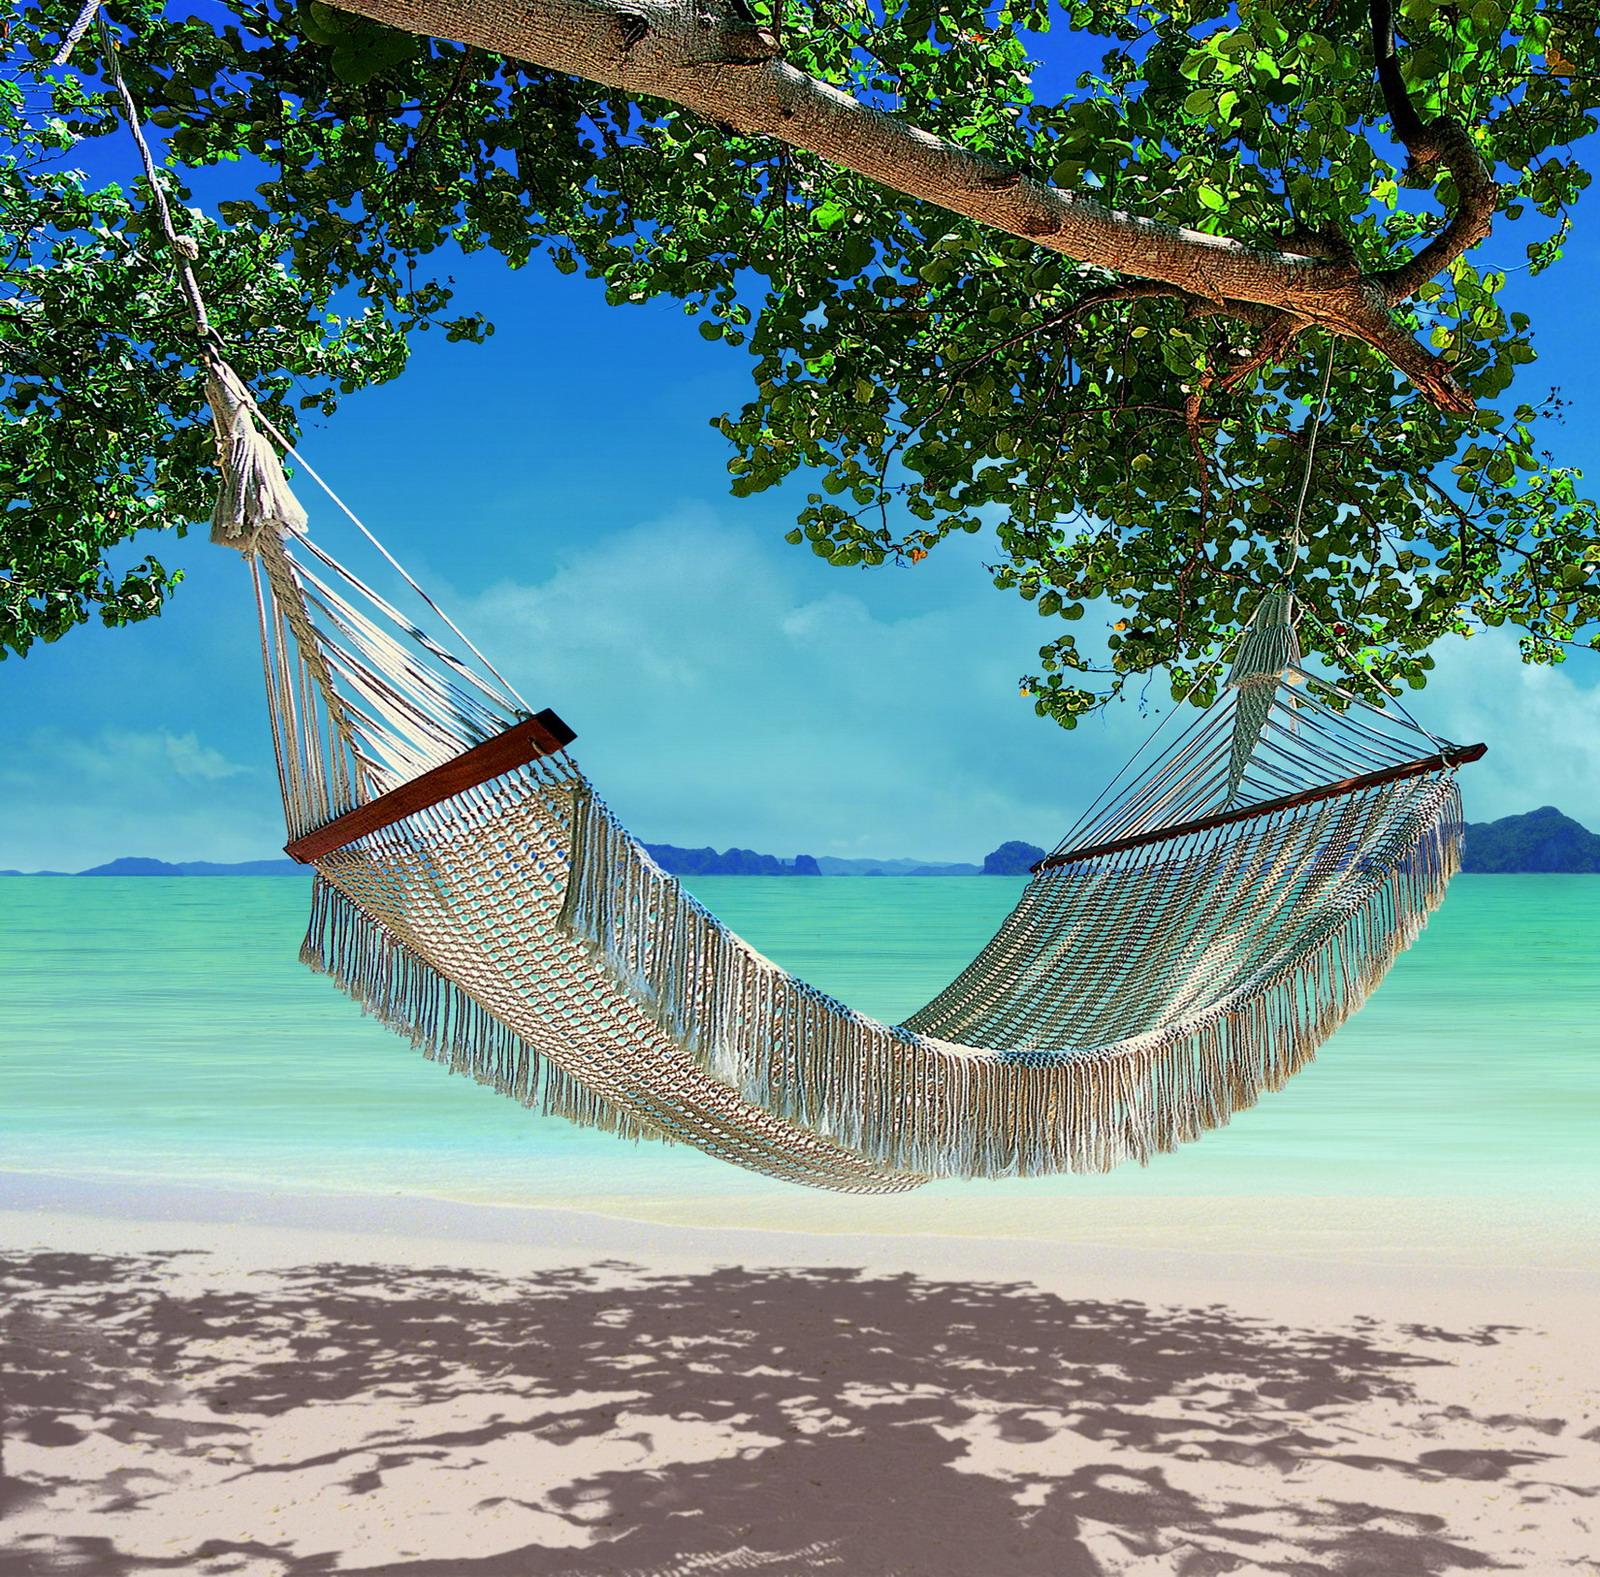 Download Hammock On The Beach Hammock on the beach 1600x1577